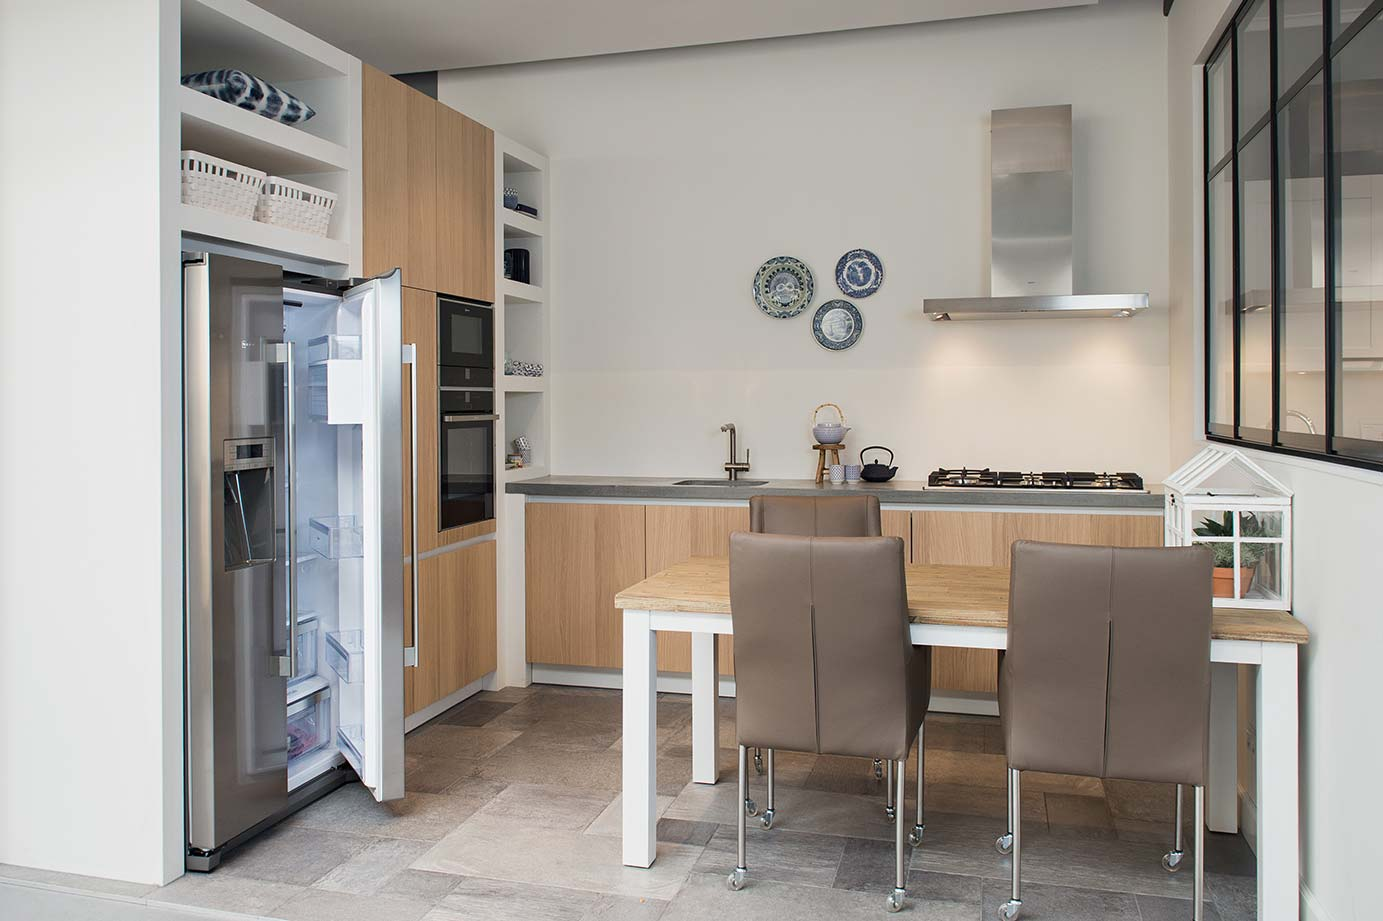 Goedkope Keuken Kastenwand : keukens tijdloze keukens houten keukens design keukens goedkope